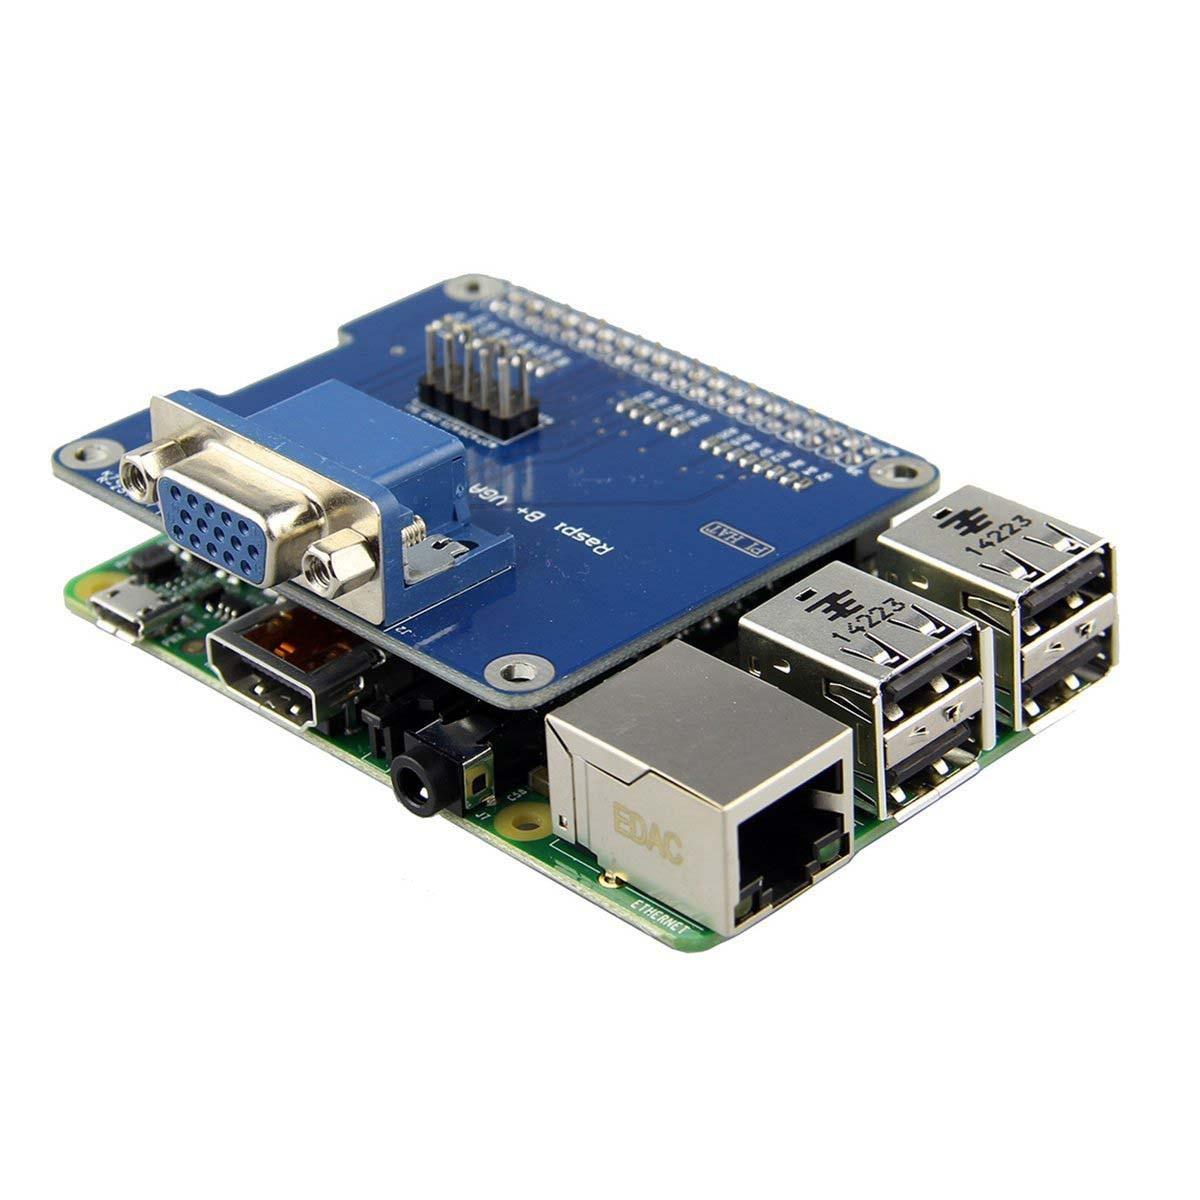 VGA Shield V2.0 Expansion Board For Raspberry Pi 3B/2B/B+/A+/VGA Shield V2.0 Expansion B ...